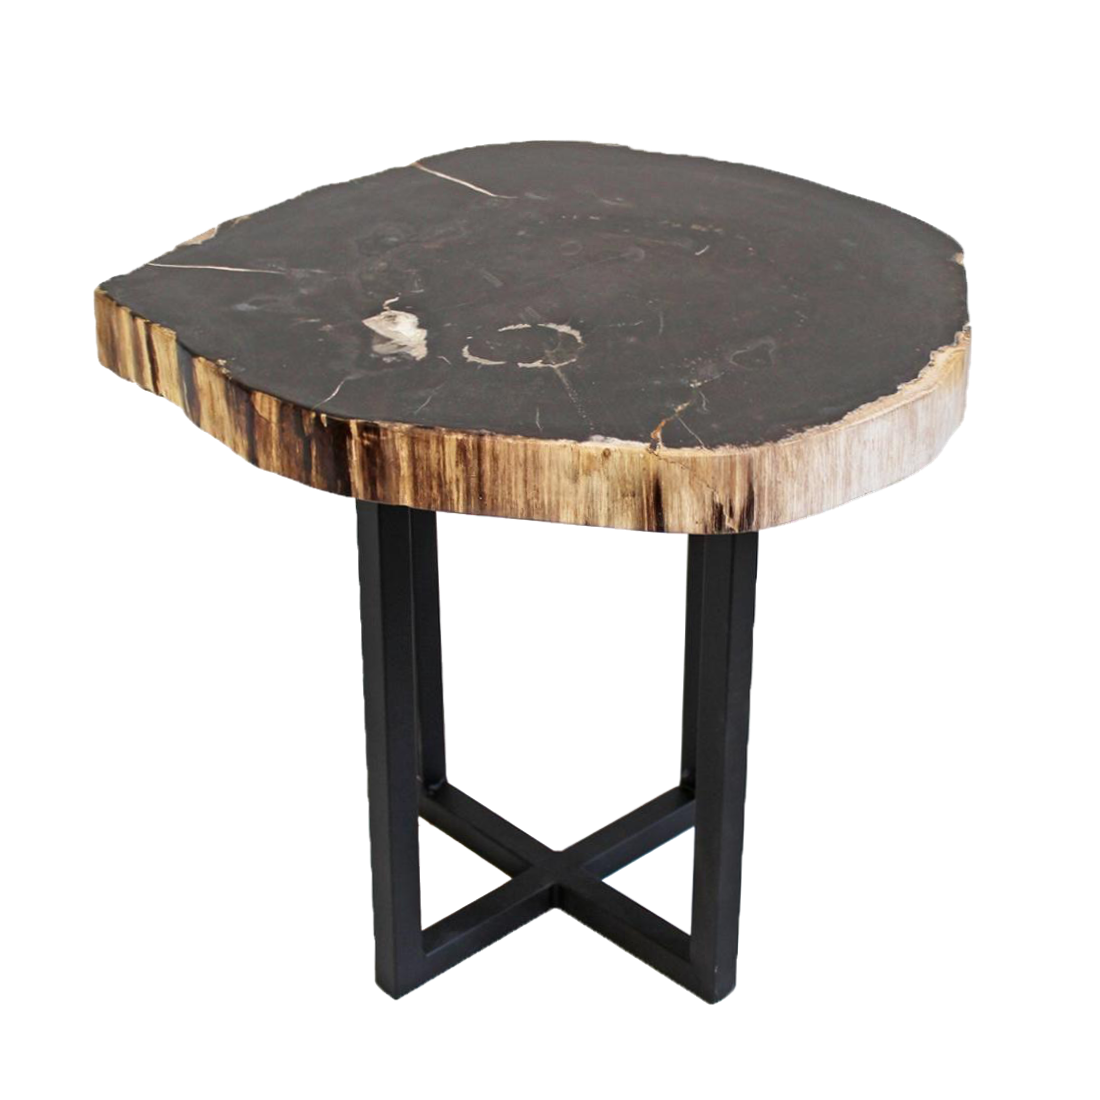 Petrified wood side table chairish